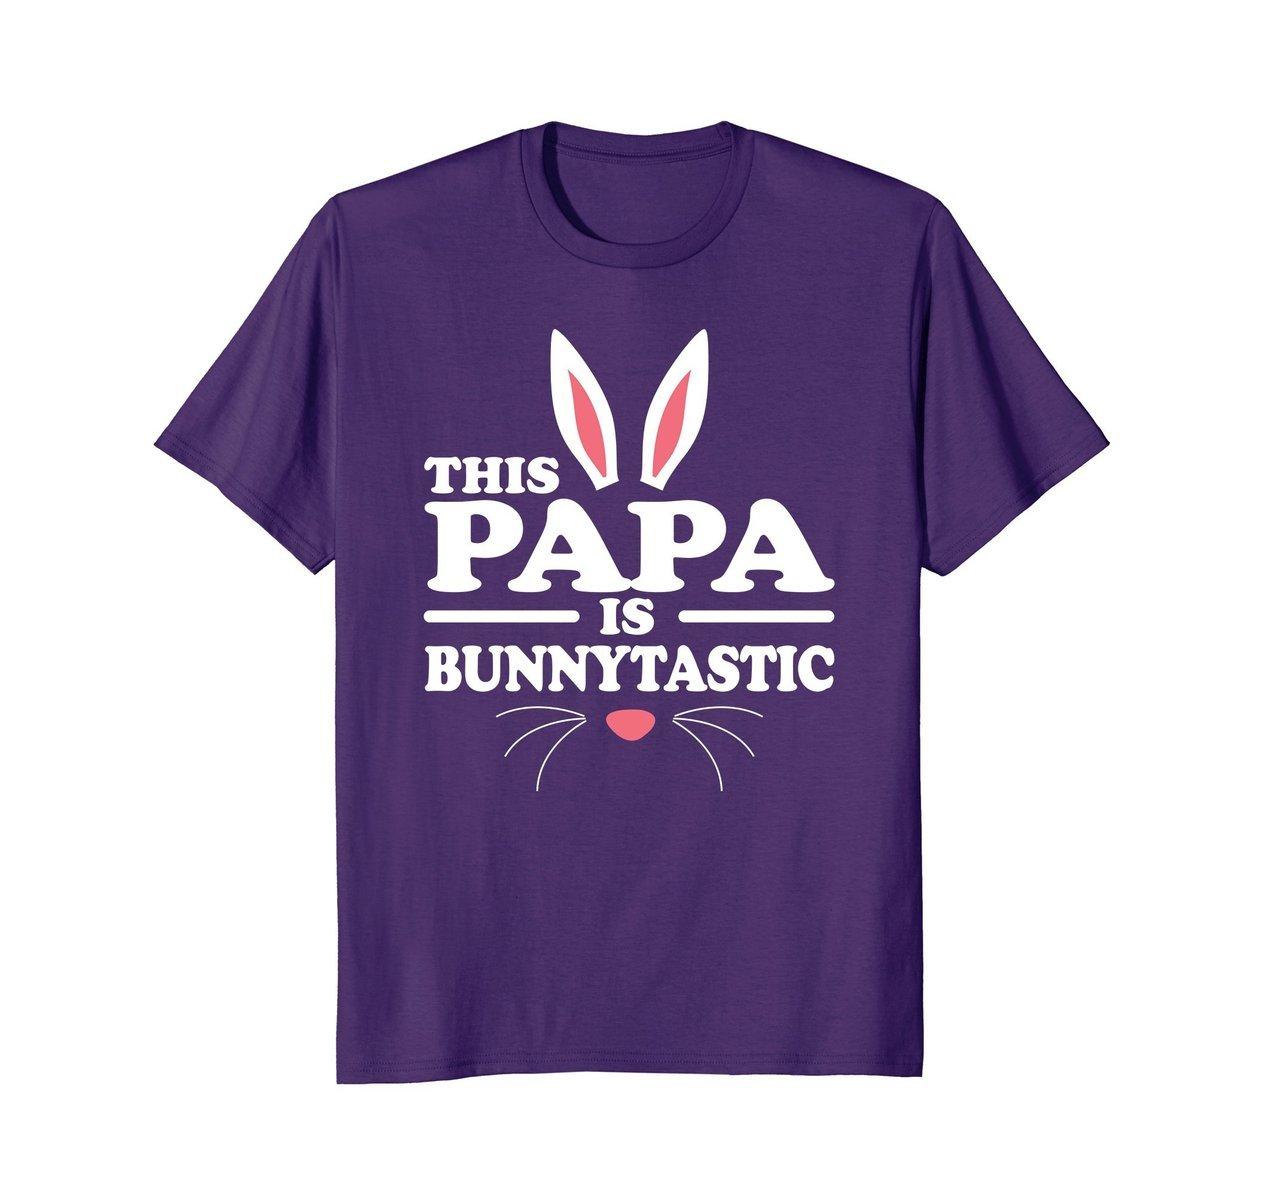 S The Papa Bunnytastic Easter Bunny Ears T Shirt V2 T Shirt Ls Shirt 58683768